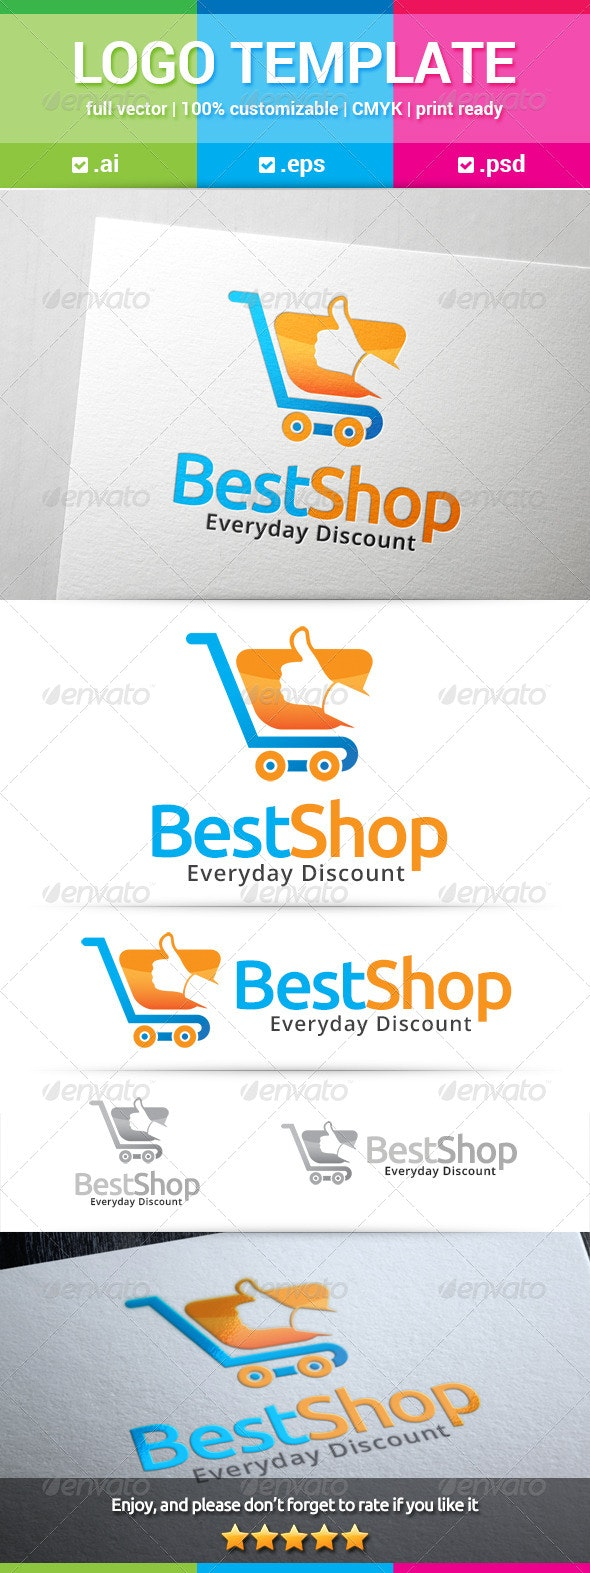 Best Shop Logo - Objects Logo Templates